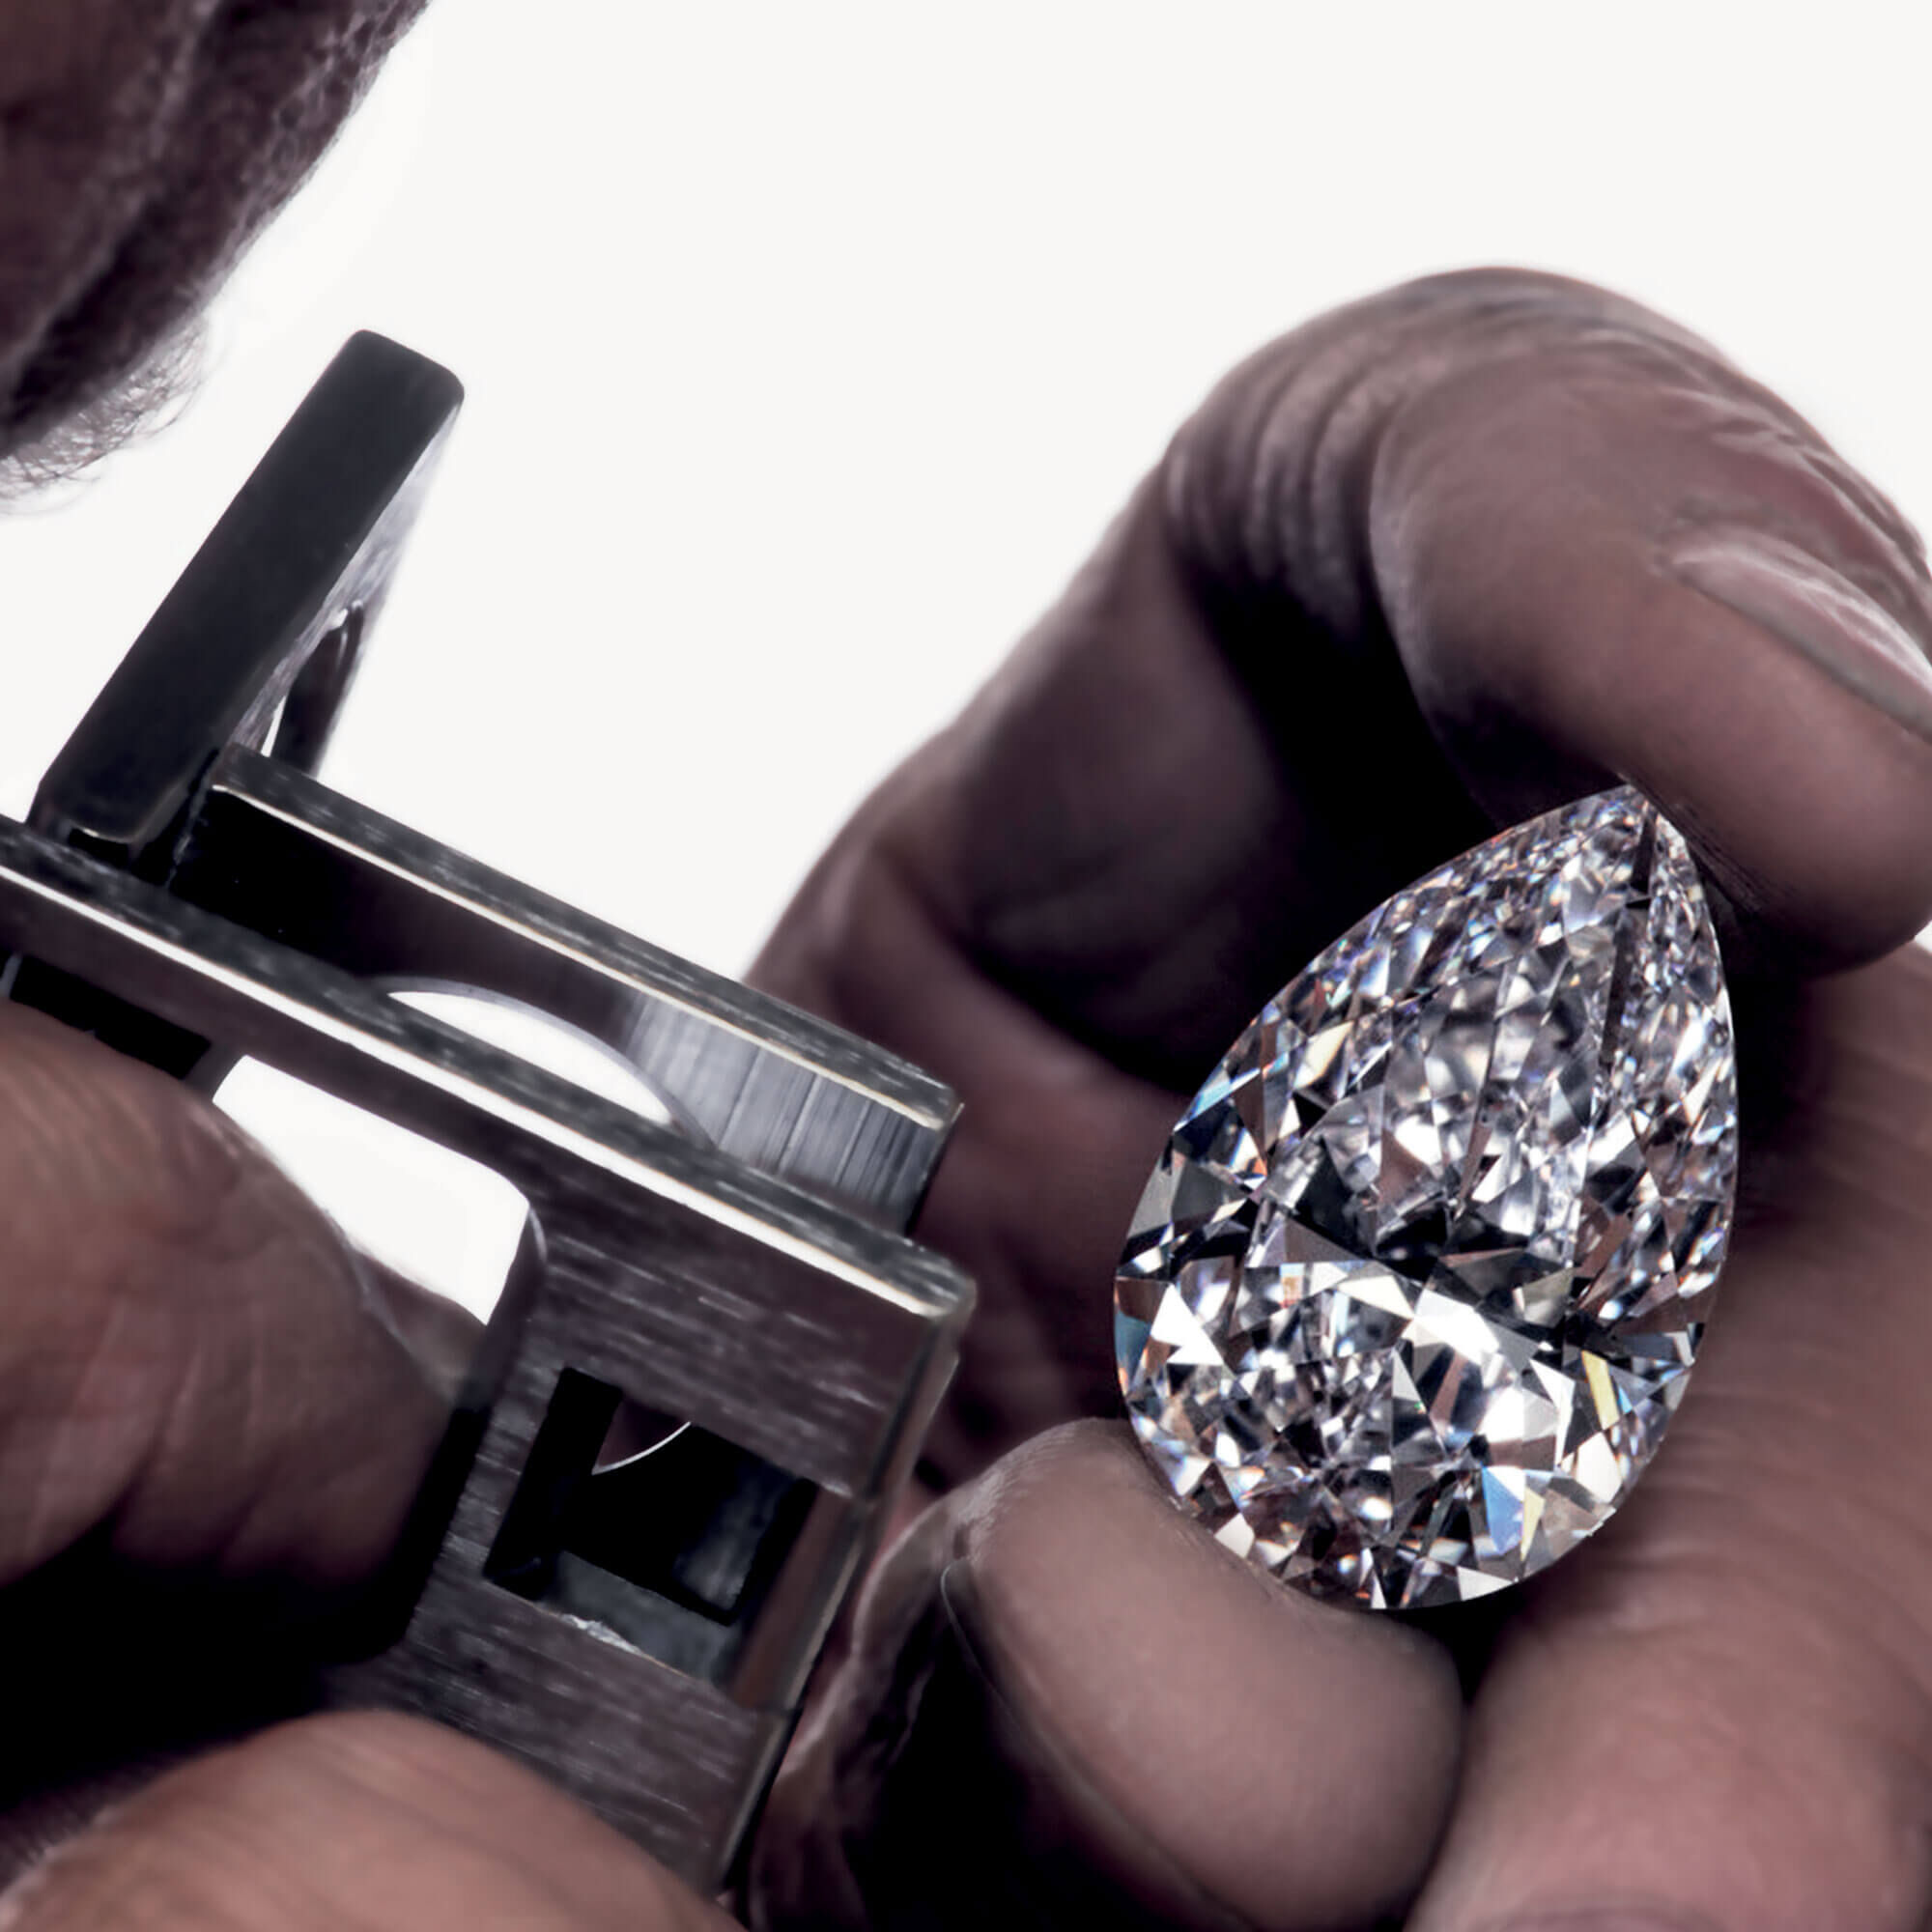 Close up of the Graff Vendôme pear shape diamond under examination